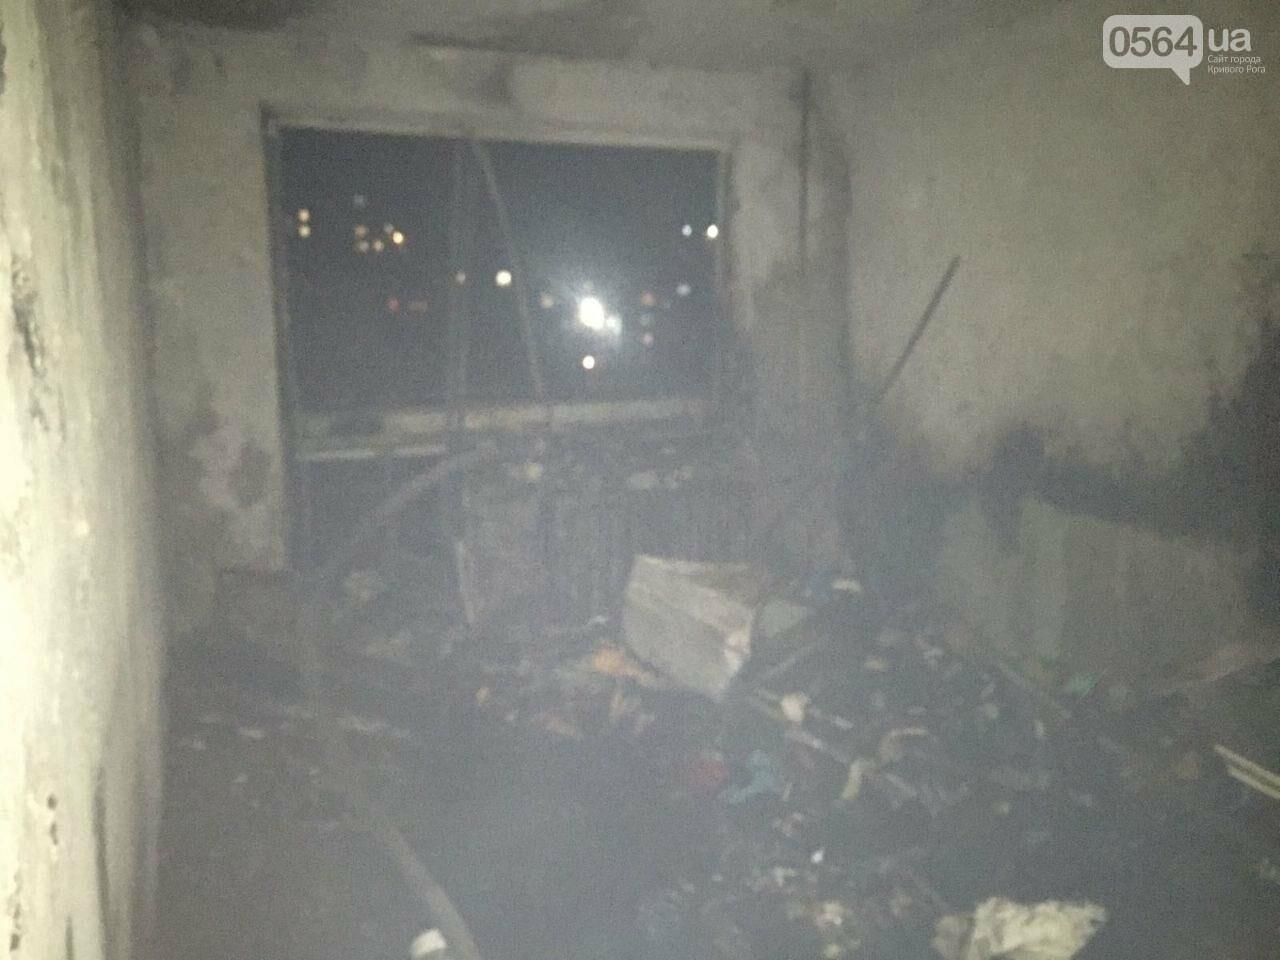 В Кривом Роге загорелась квартира на 6 этаже. Найдено тело мужчины, - ФОТО 18+, ВИДЕО, ОБНОВЛЕНО, фото-2